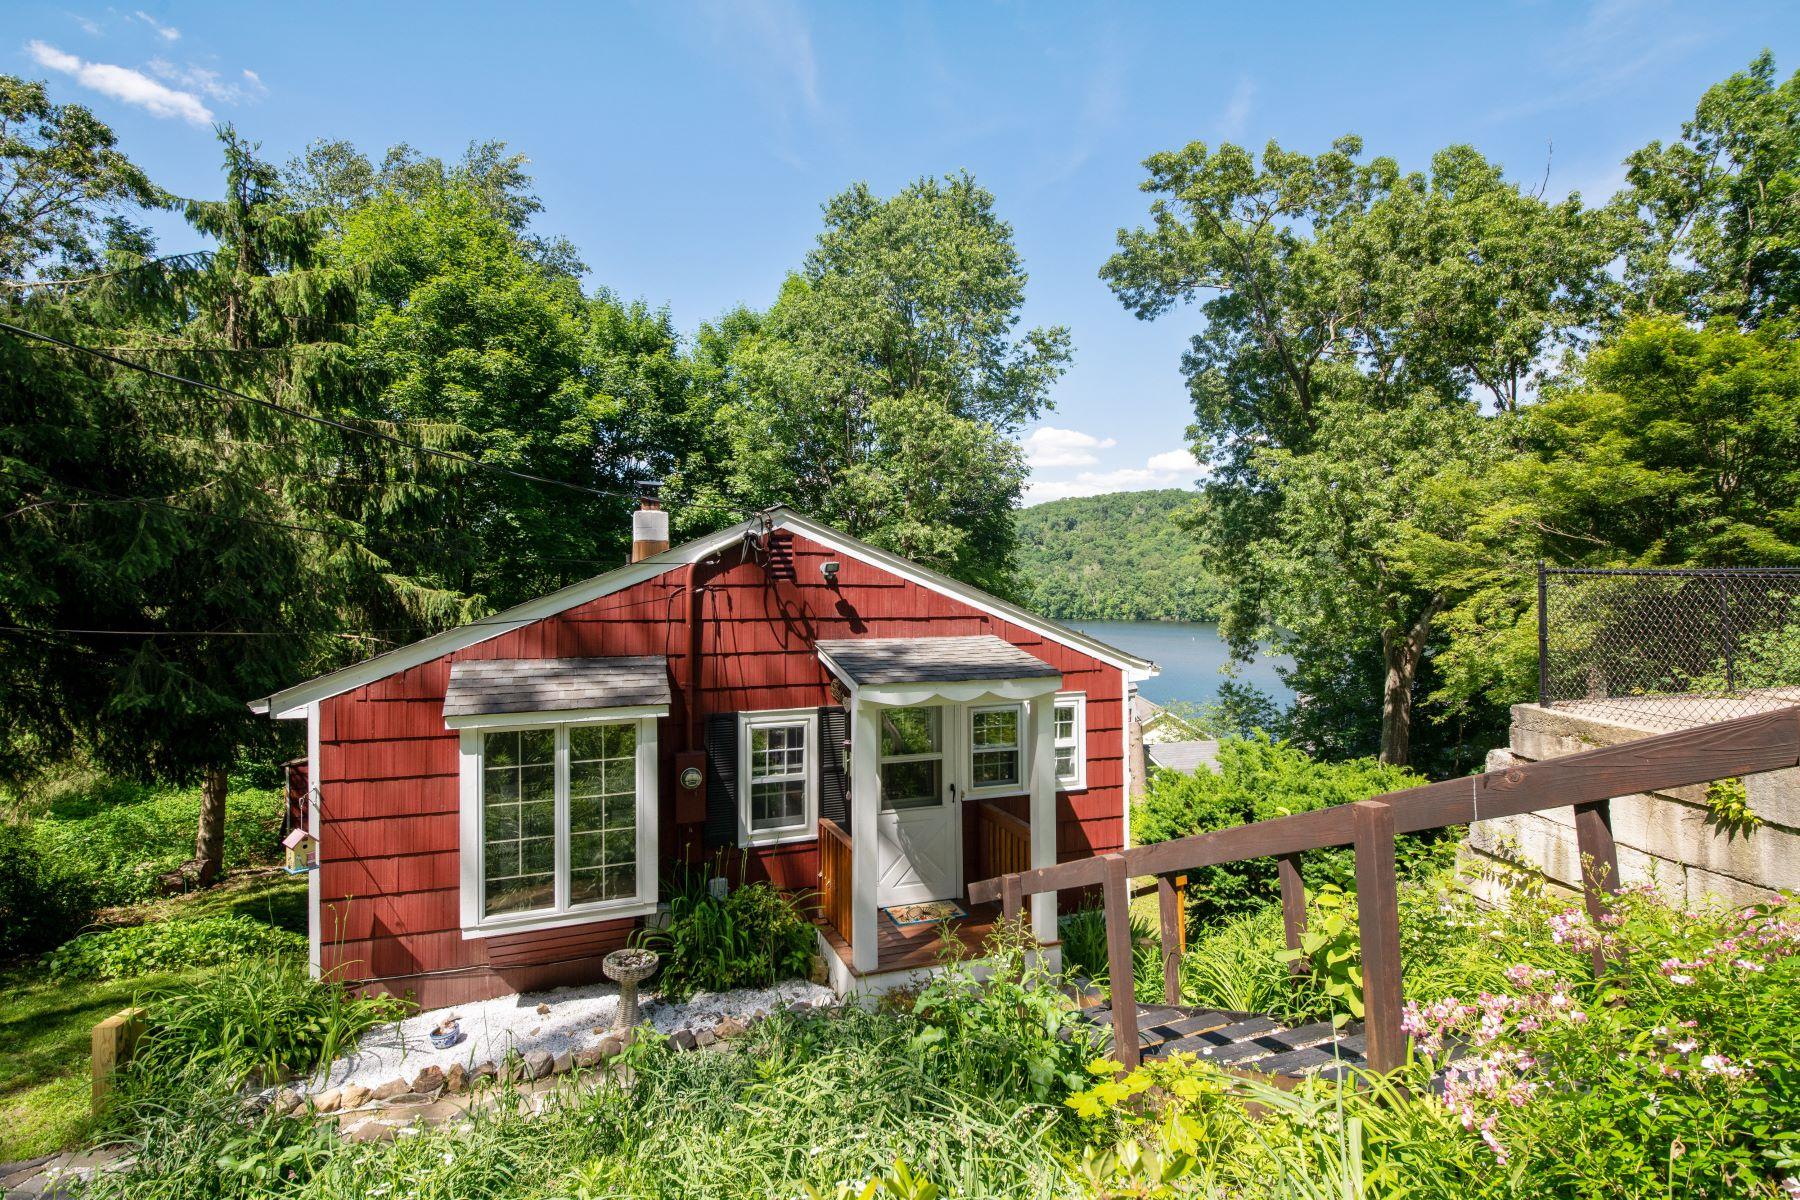 Single Family Homes のために 売買 アット Wonderful Cottage With Water Views 27 Locust Lane, Newtown, コネチカット 06482 アメリカ